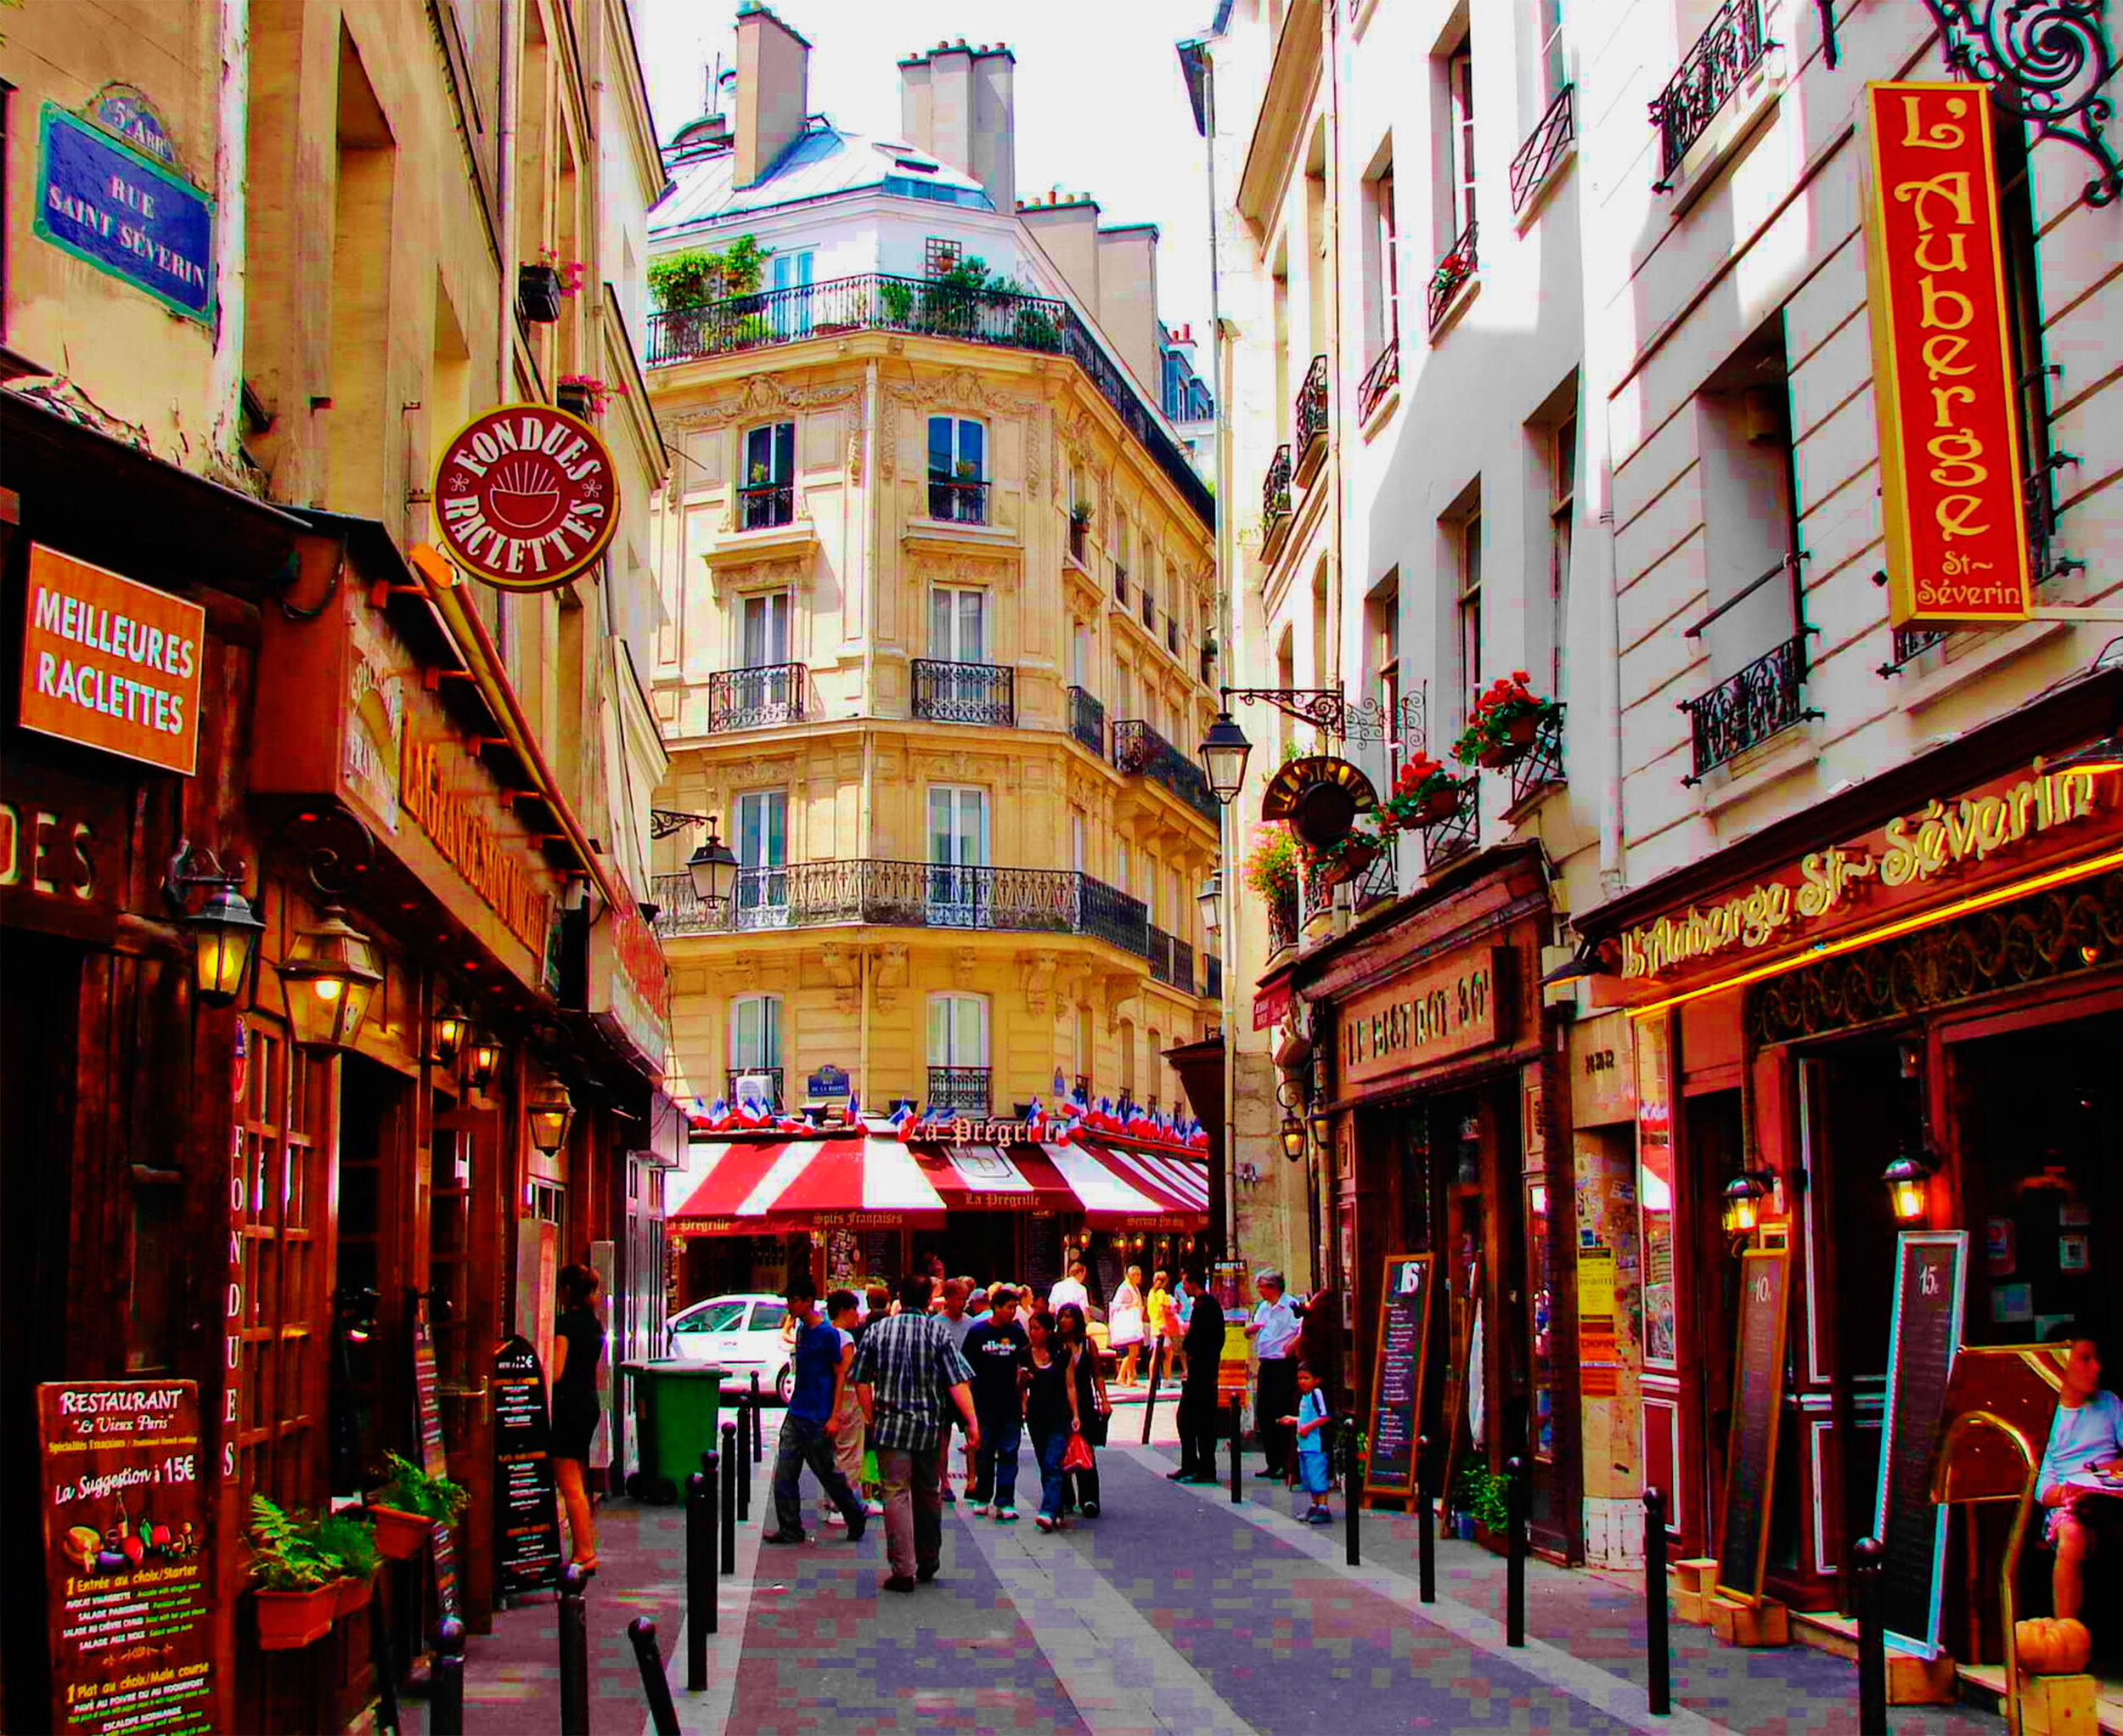 6-Andar pela badalada Quartier Latin/Jardin des Plantes/ Panthéon -